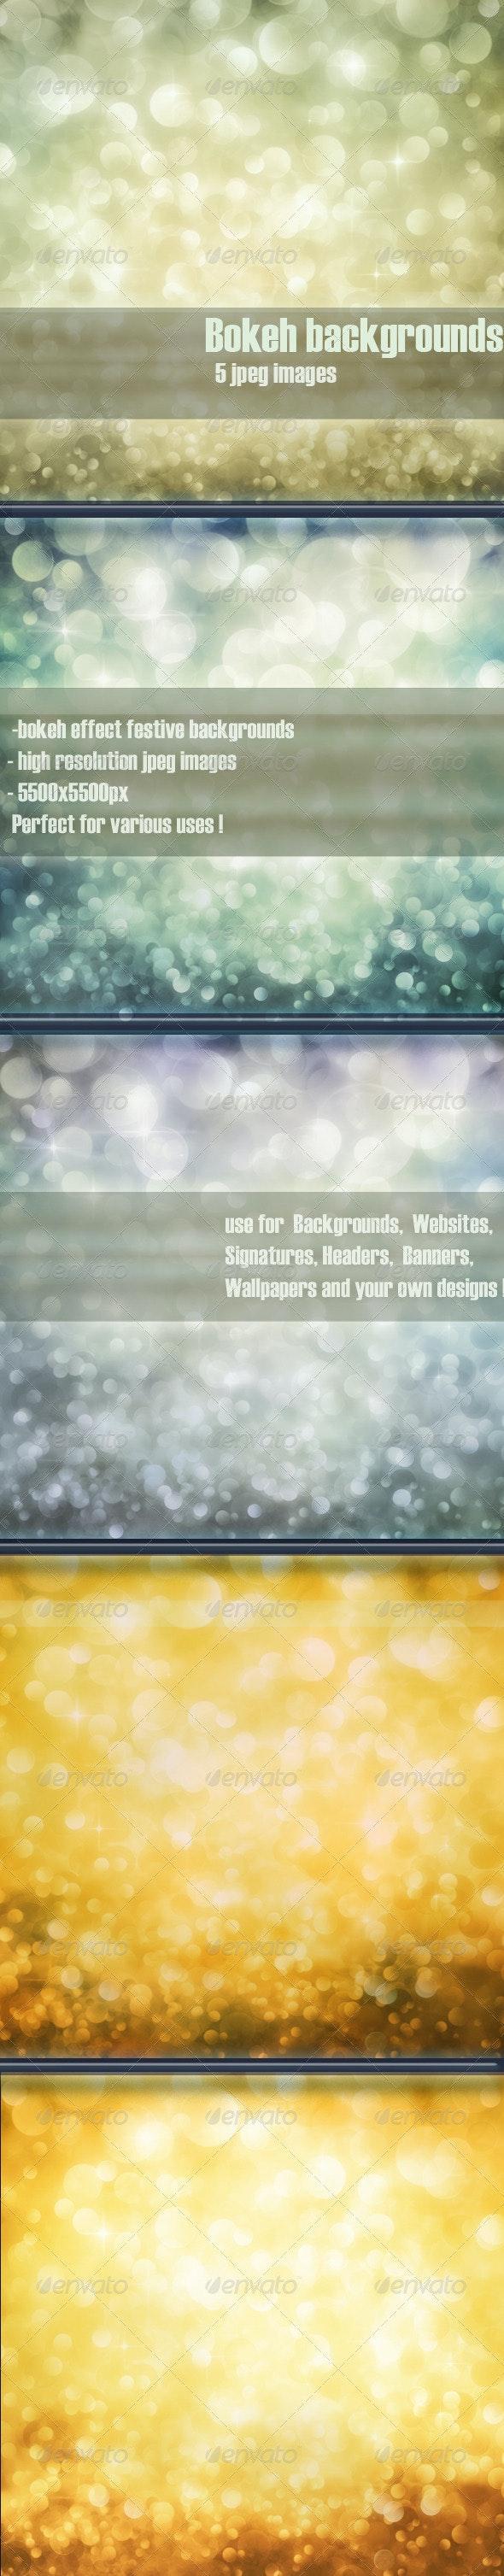 Festive bokeh backgrounds vol.3 - Backgrounds Graphics